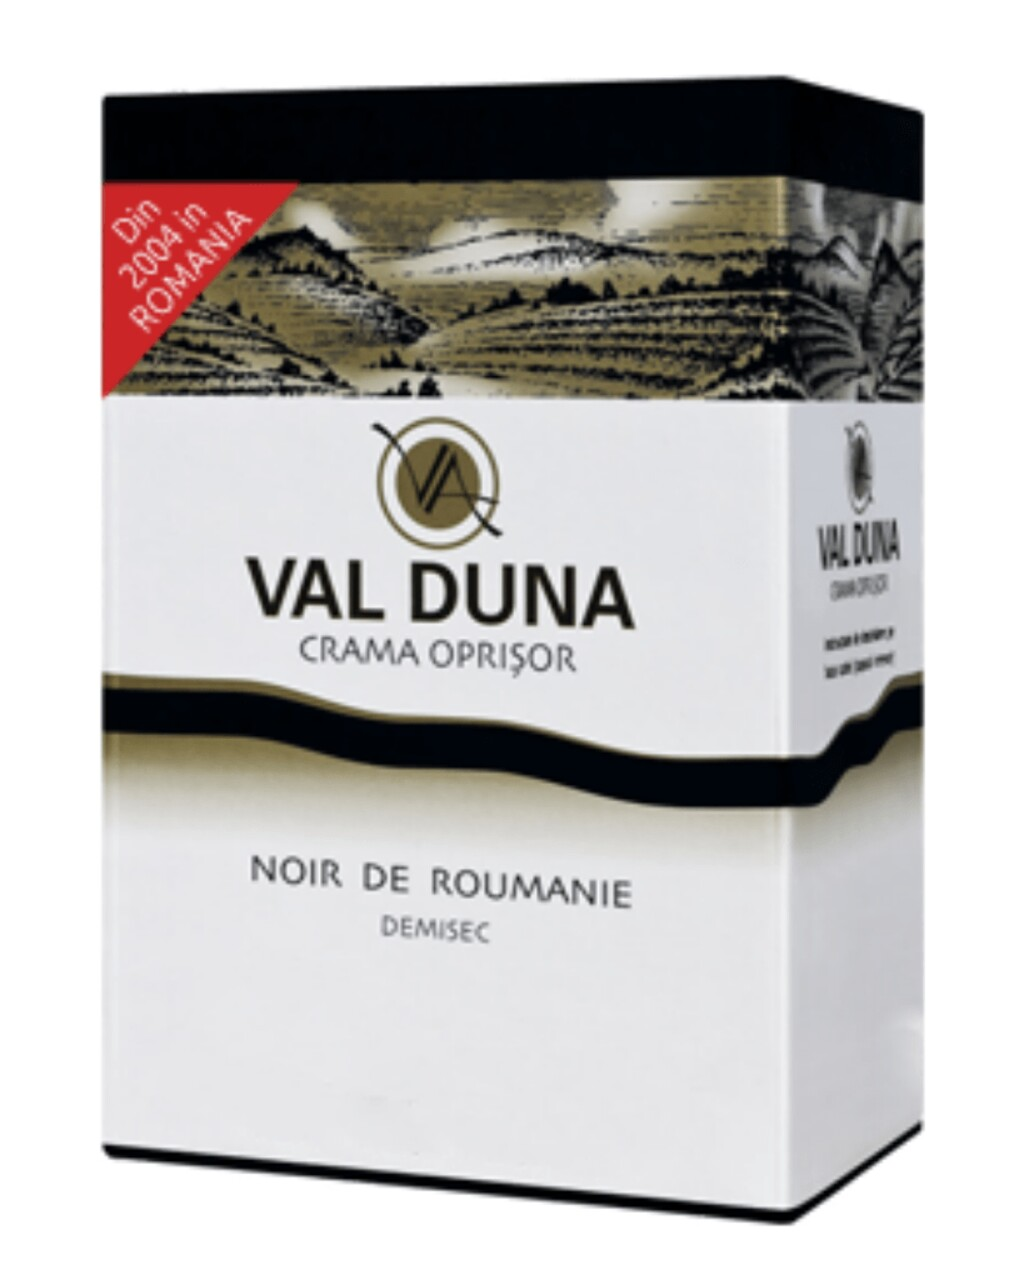 Oprisor Val Duna Noir de Roumanie BIB 5L